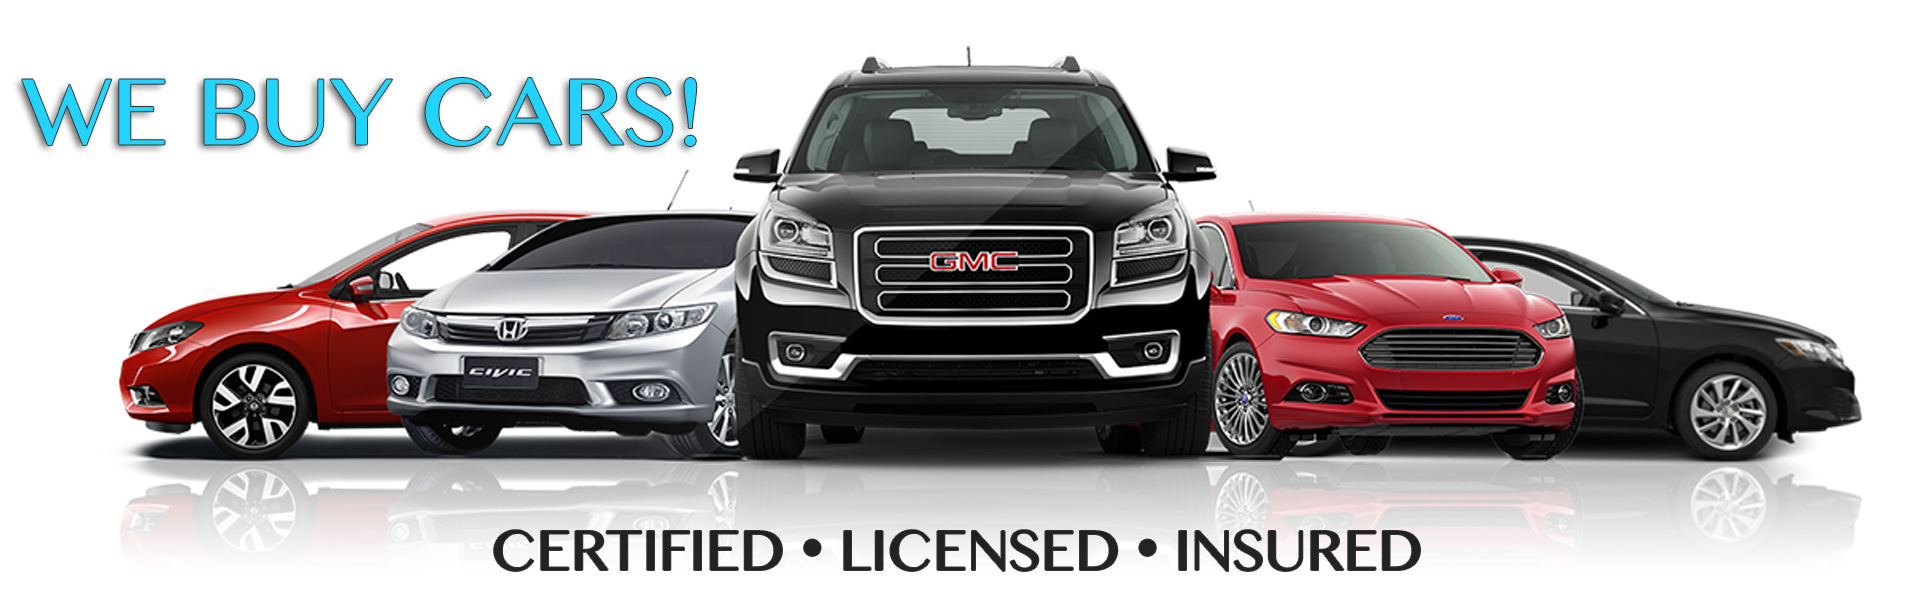 We buy cars | Cloud 9 Detail - Utah\'s Best Mobile Detail Service